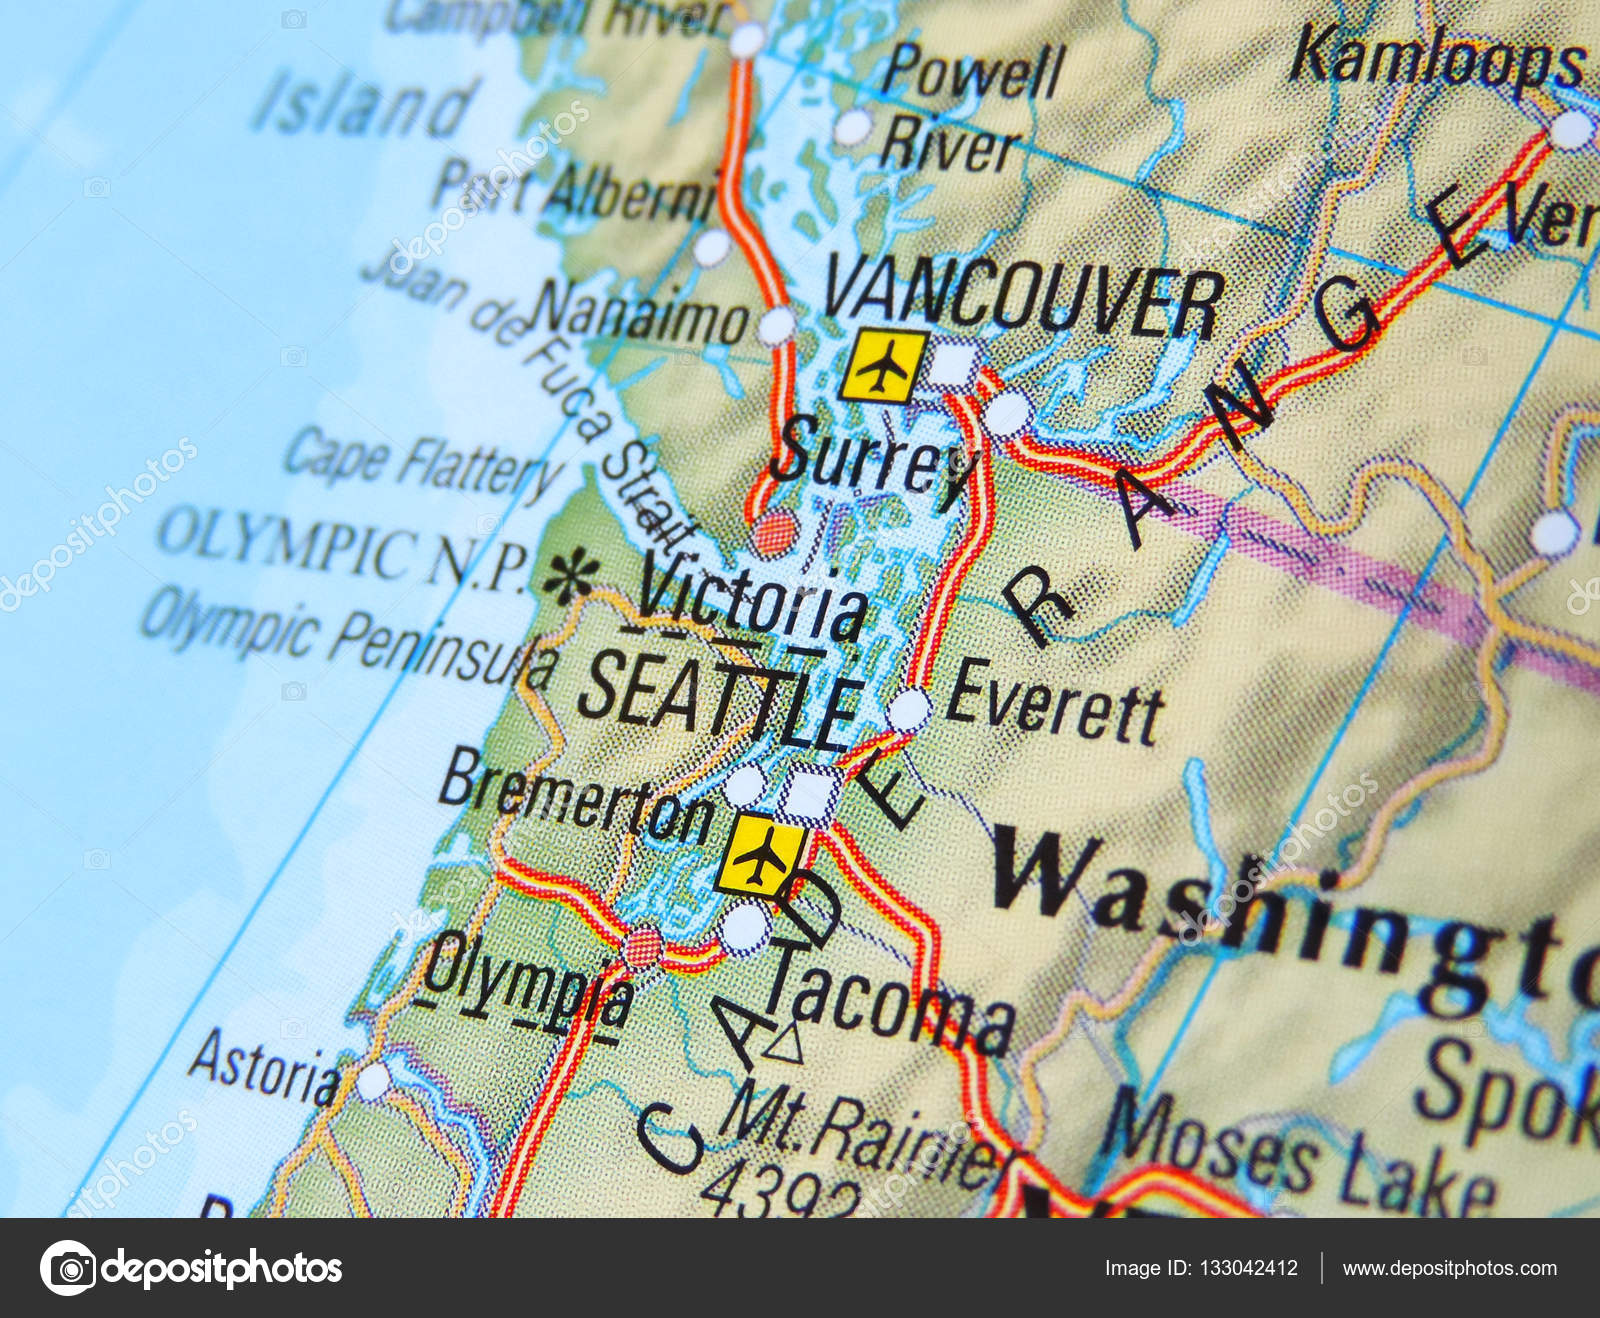 Seattle Cartina.Usa With Focus On Seattle Stock Photo C Eivaisla 133042412